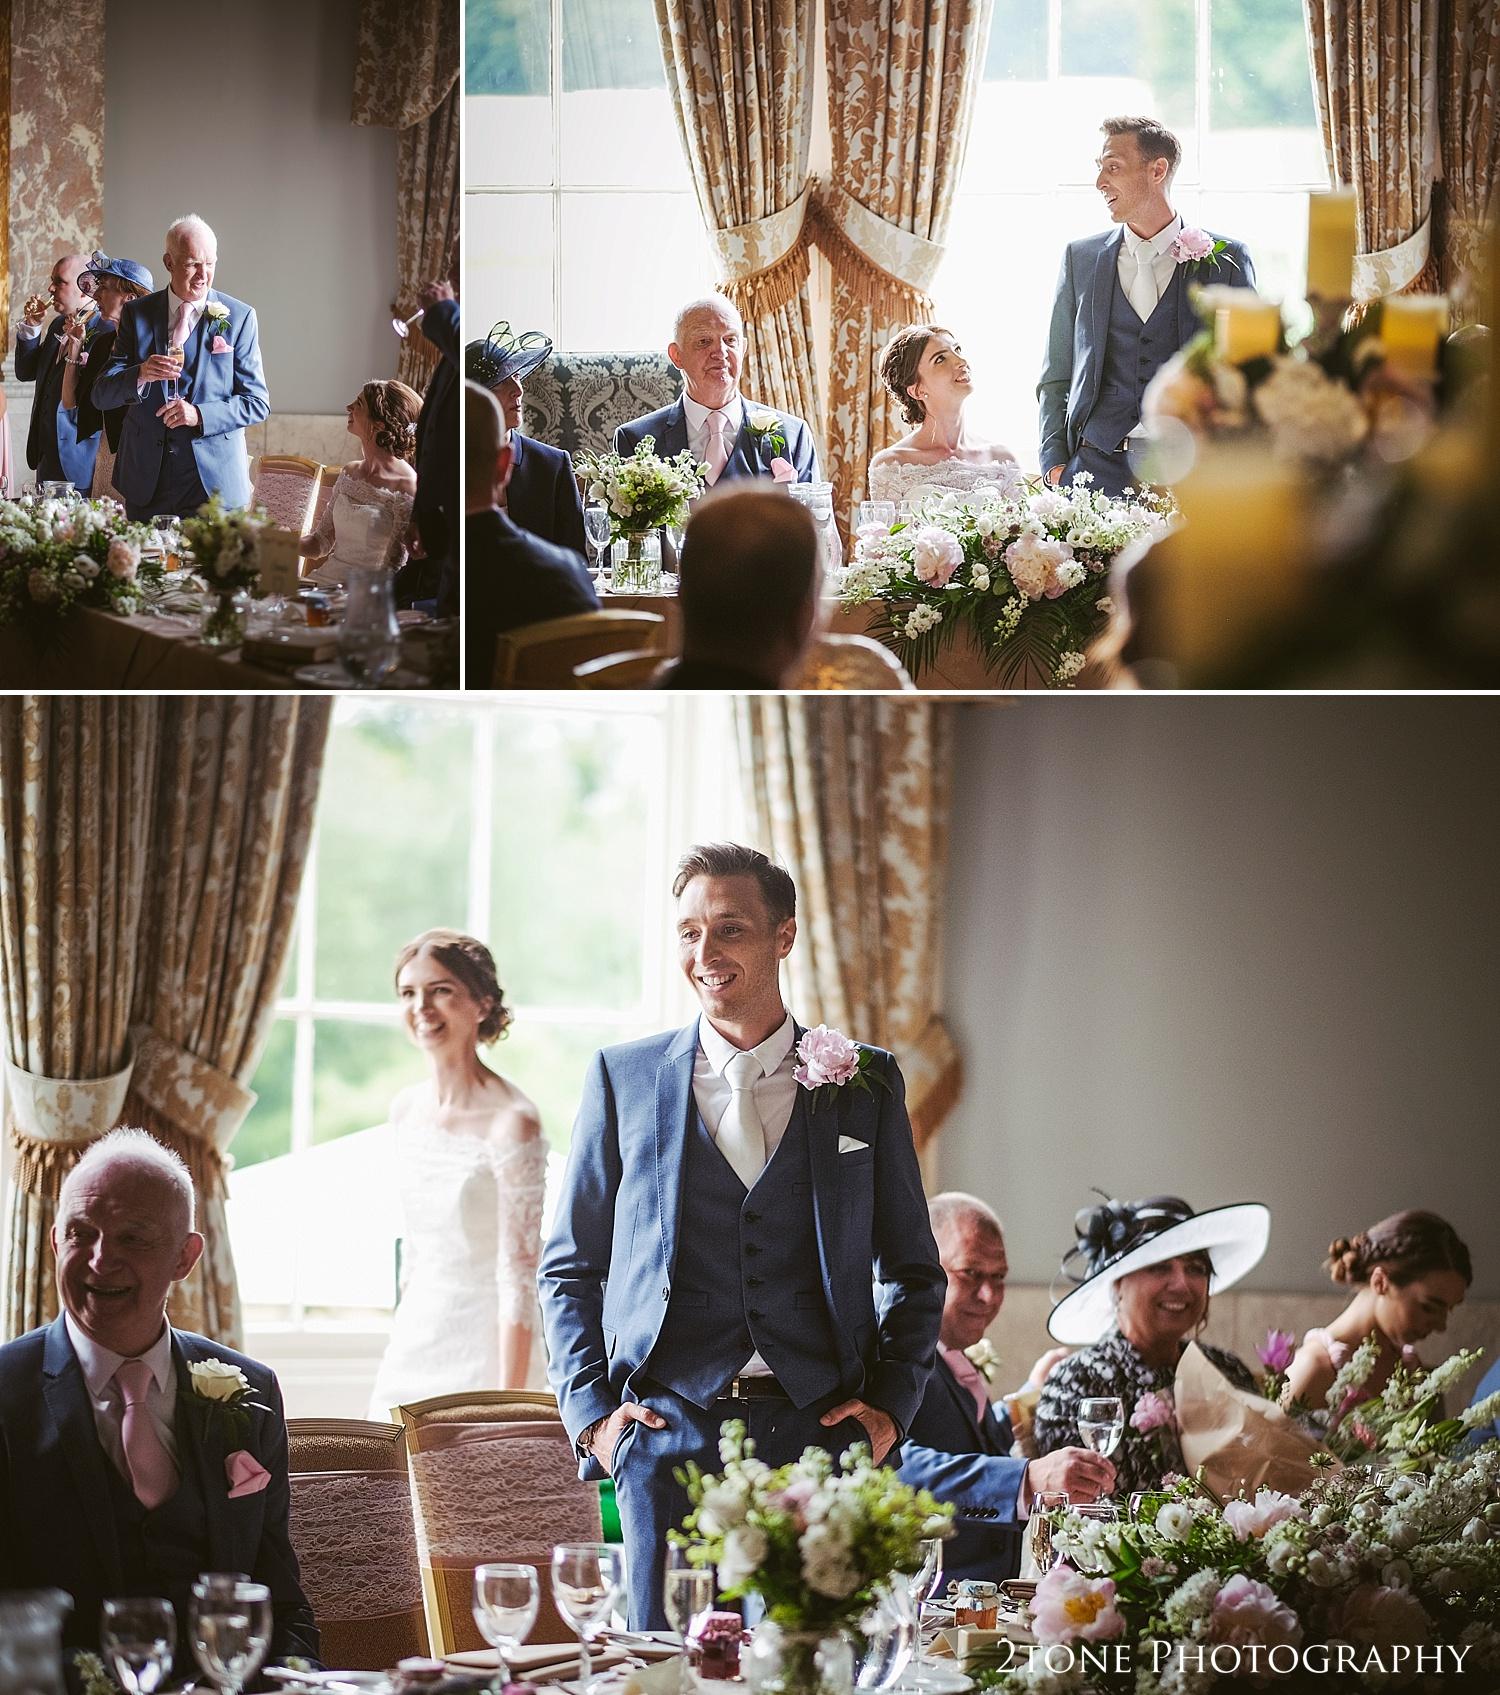 Wedding day speeches at Wynyard Hall by Durham based wedding photographers www.2tonephotography.co.uk